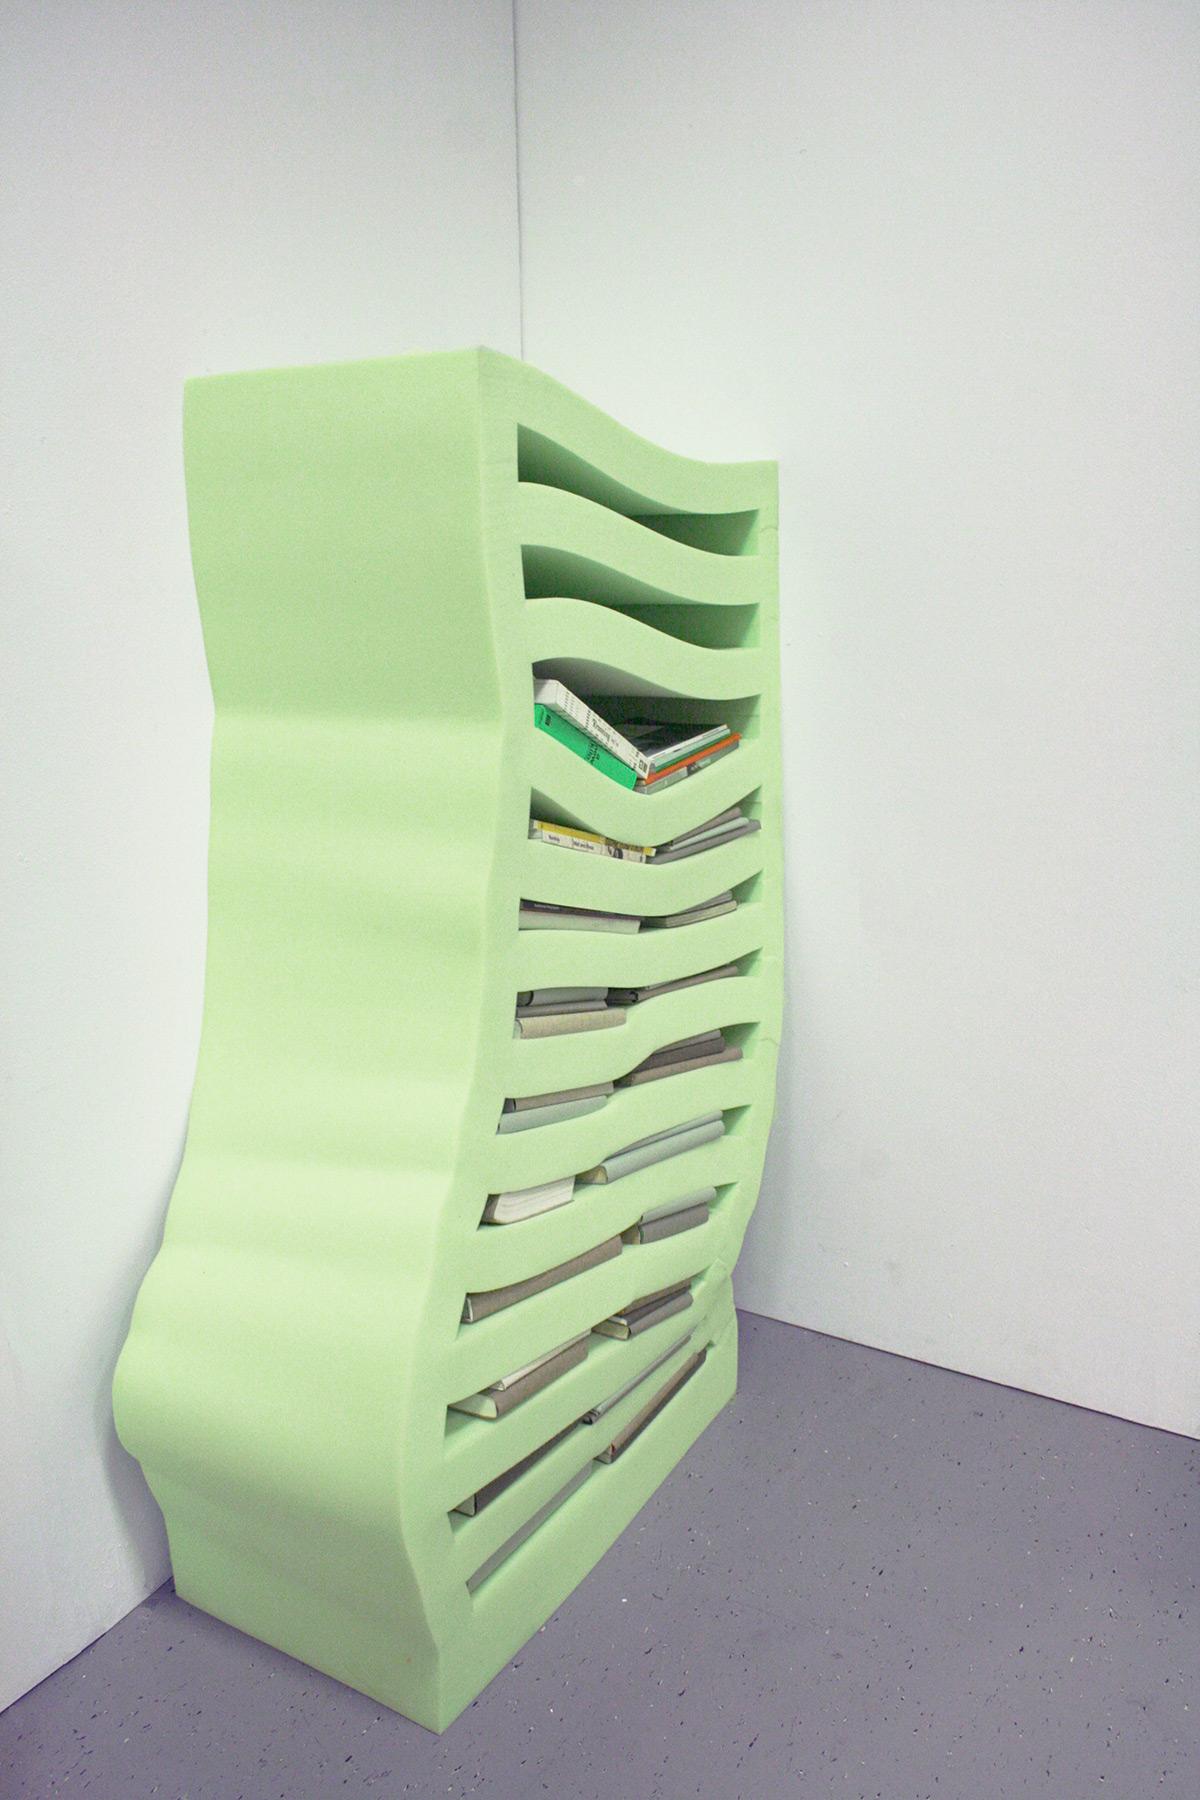 awesome-design-ideas-Soft-Cabinet-High-Dewi-van-de-Klomp-4